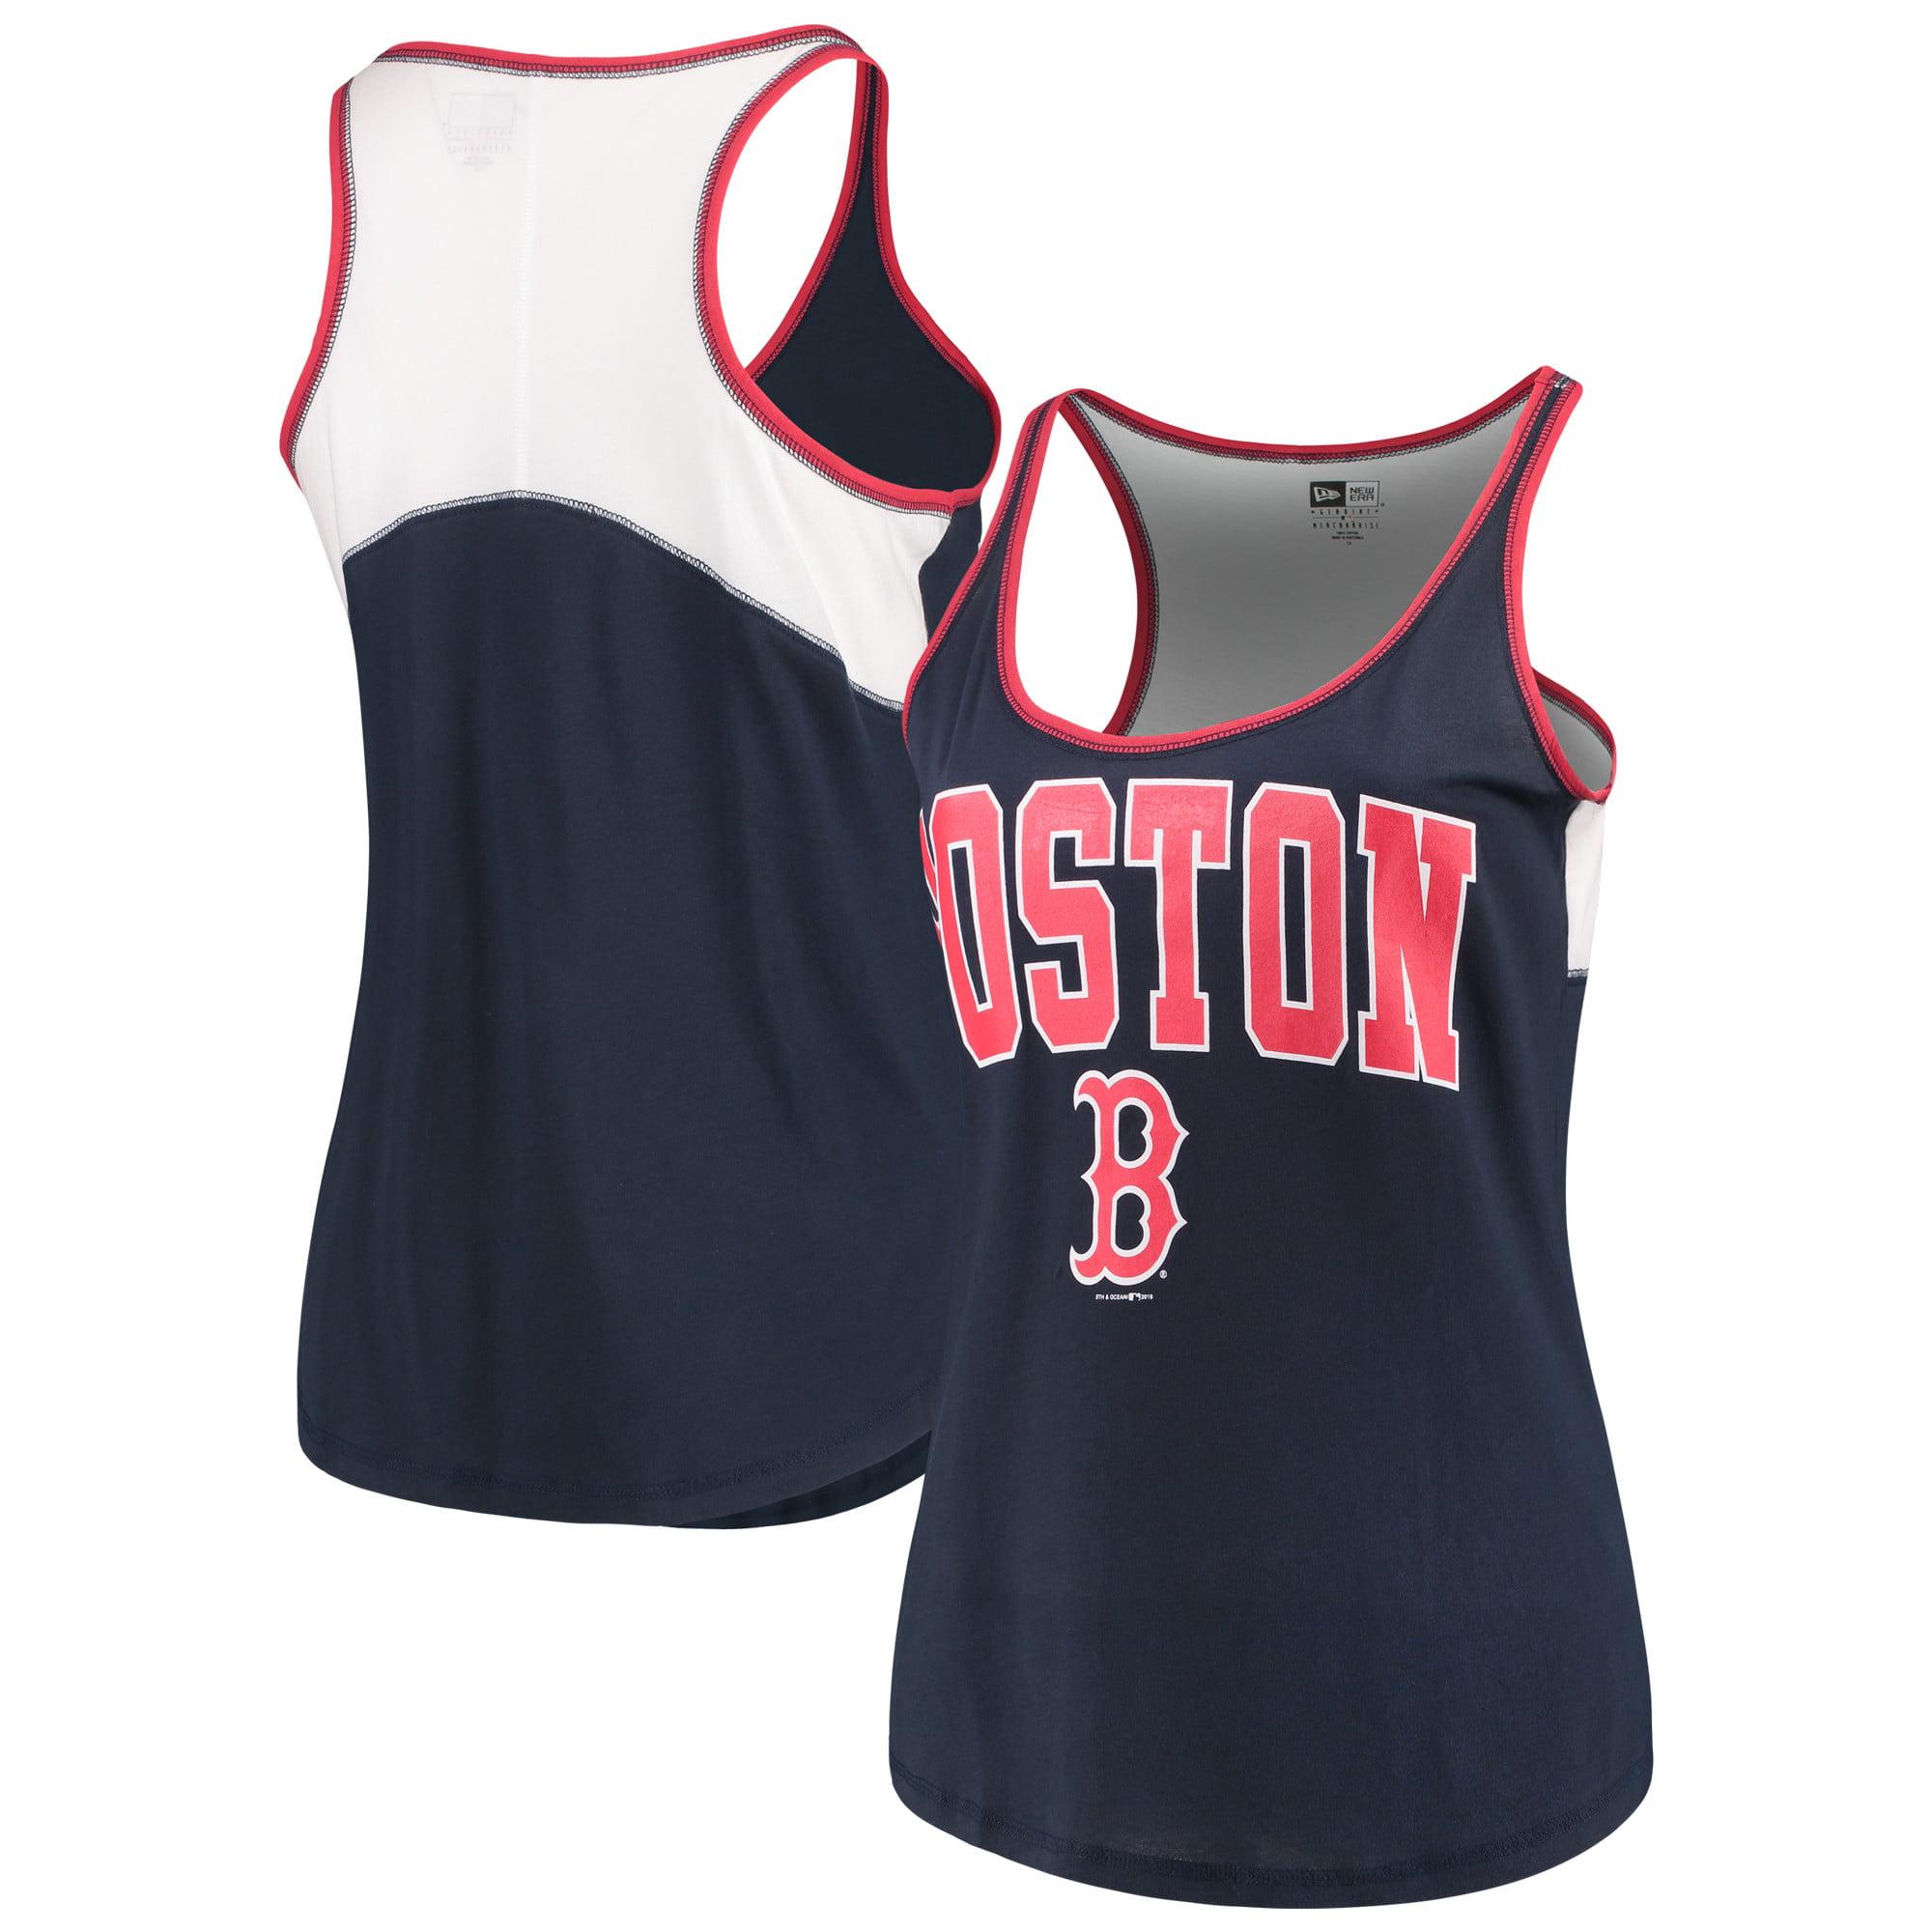 Boston Red Sox 5th & Ocean by New Era Women's Plus Size Baby Jersey Racerback Tank Top - Navy